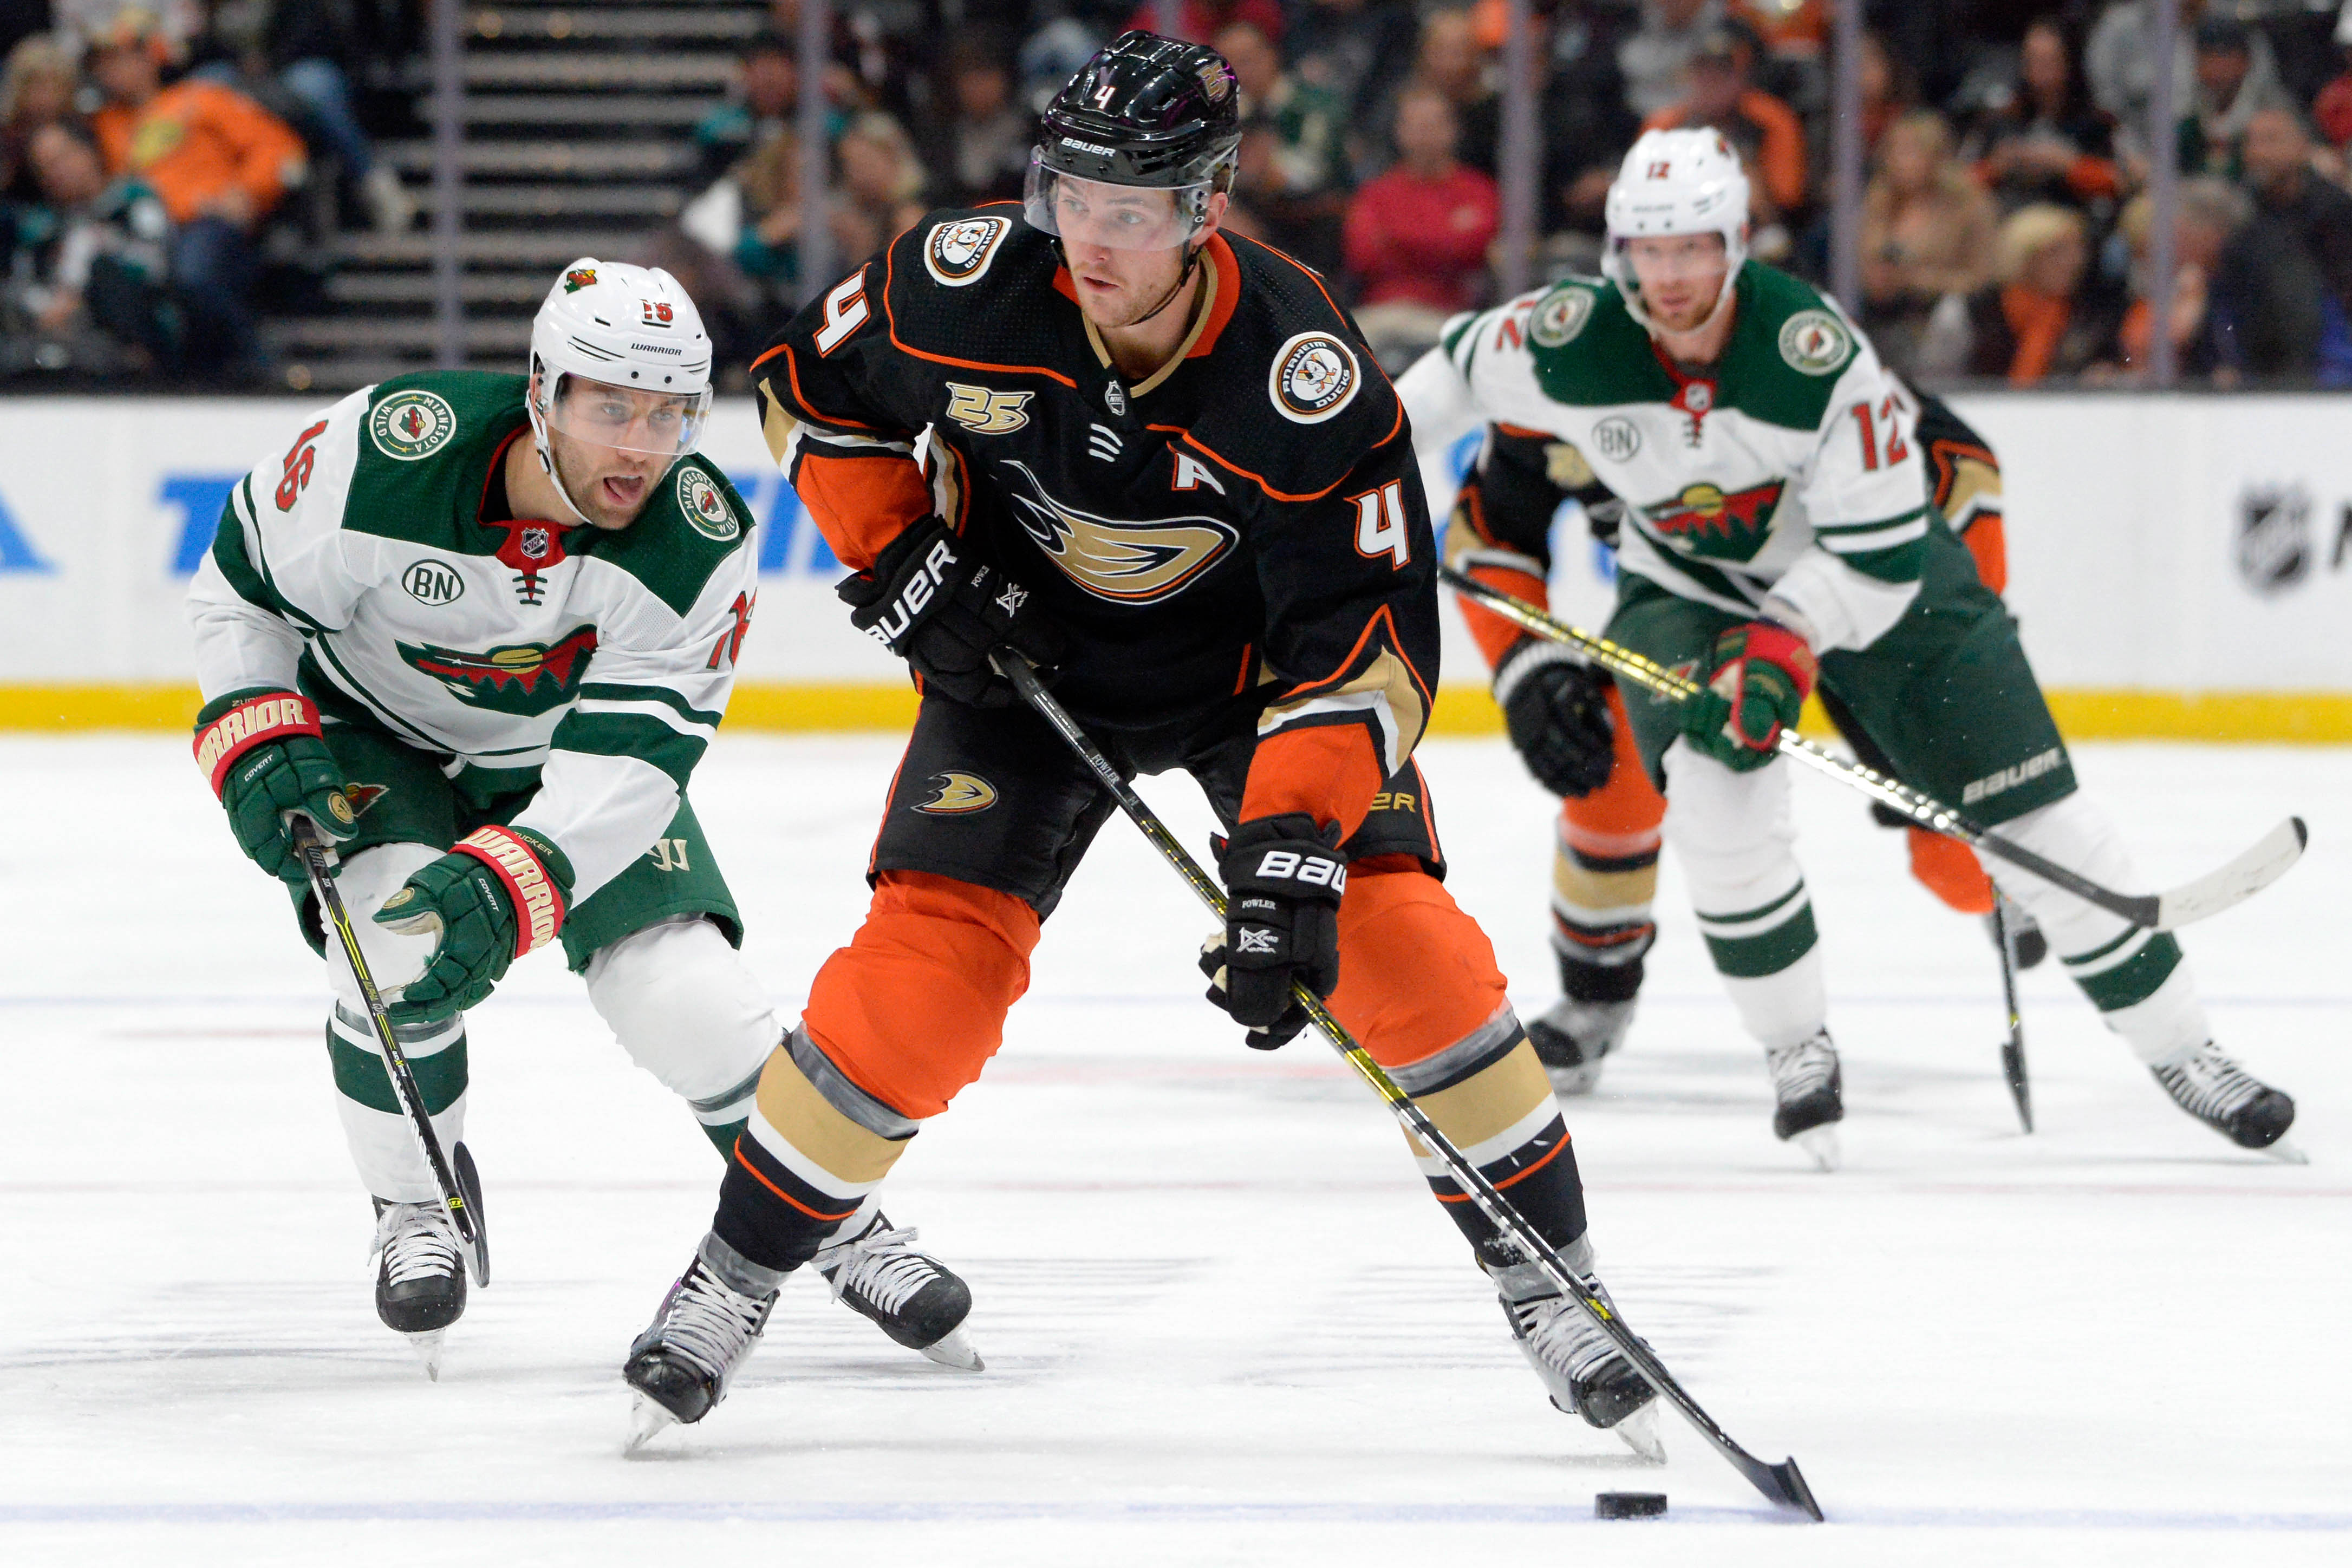 Game Preview: Minnesota Wild vs. Anaheim Ducks 2/19/19 @ 7:00PM CST at Xcel Energy Center